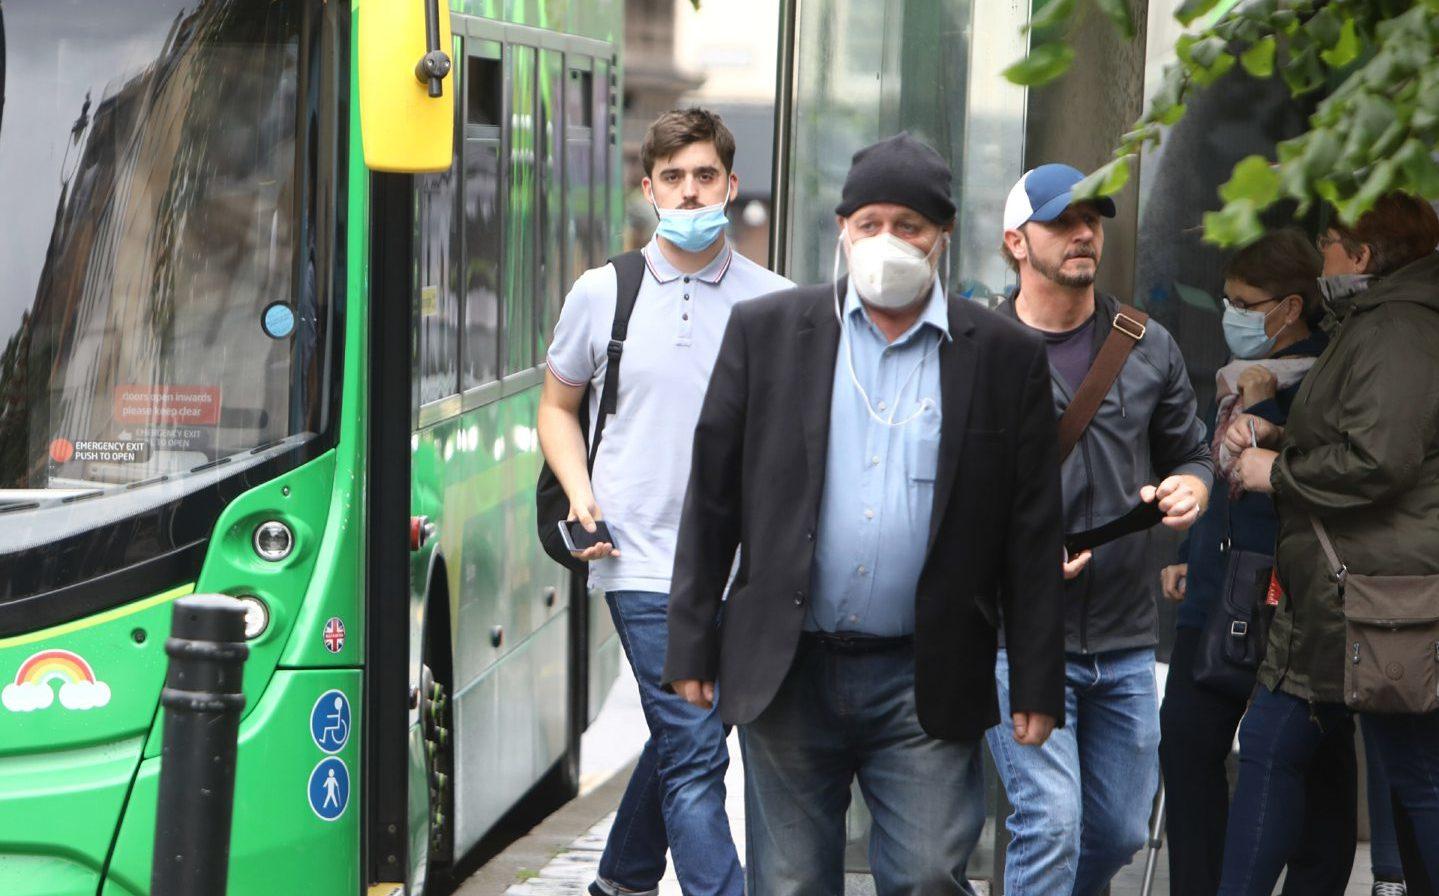 Face masks are now mandatory on public transport.